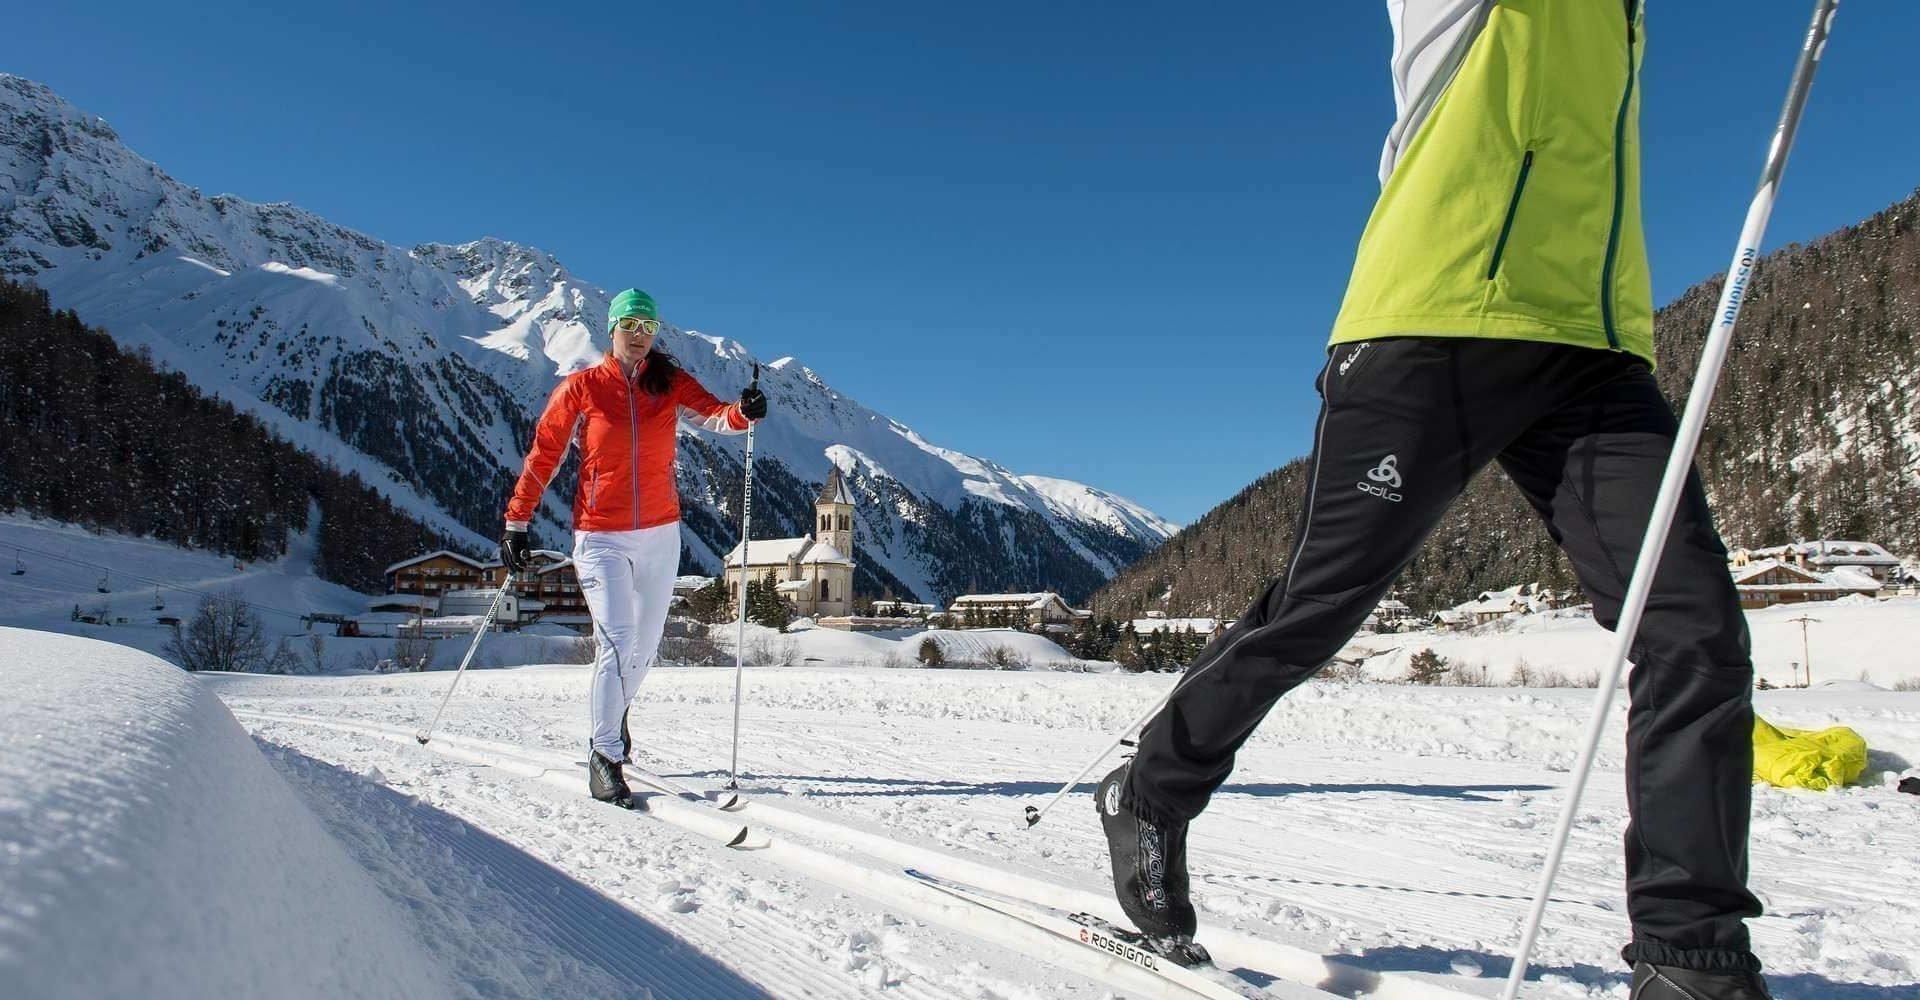 langlaufen-skigebiet-rosskopf